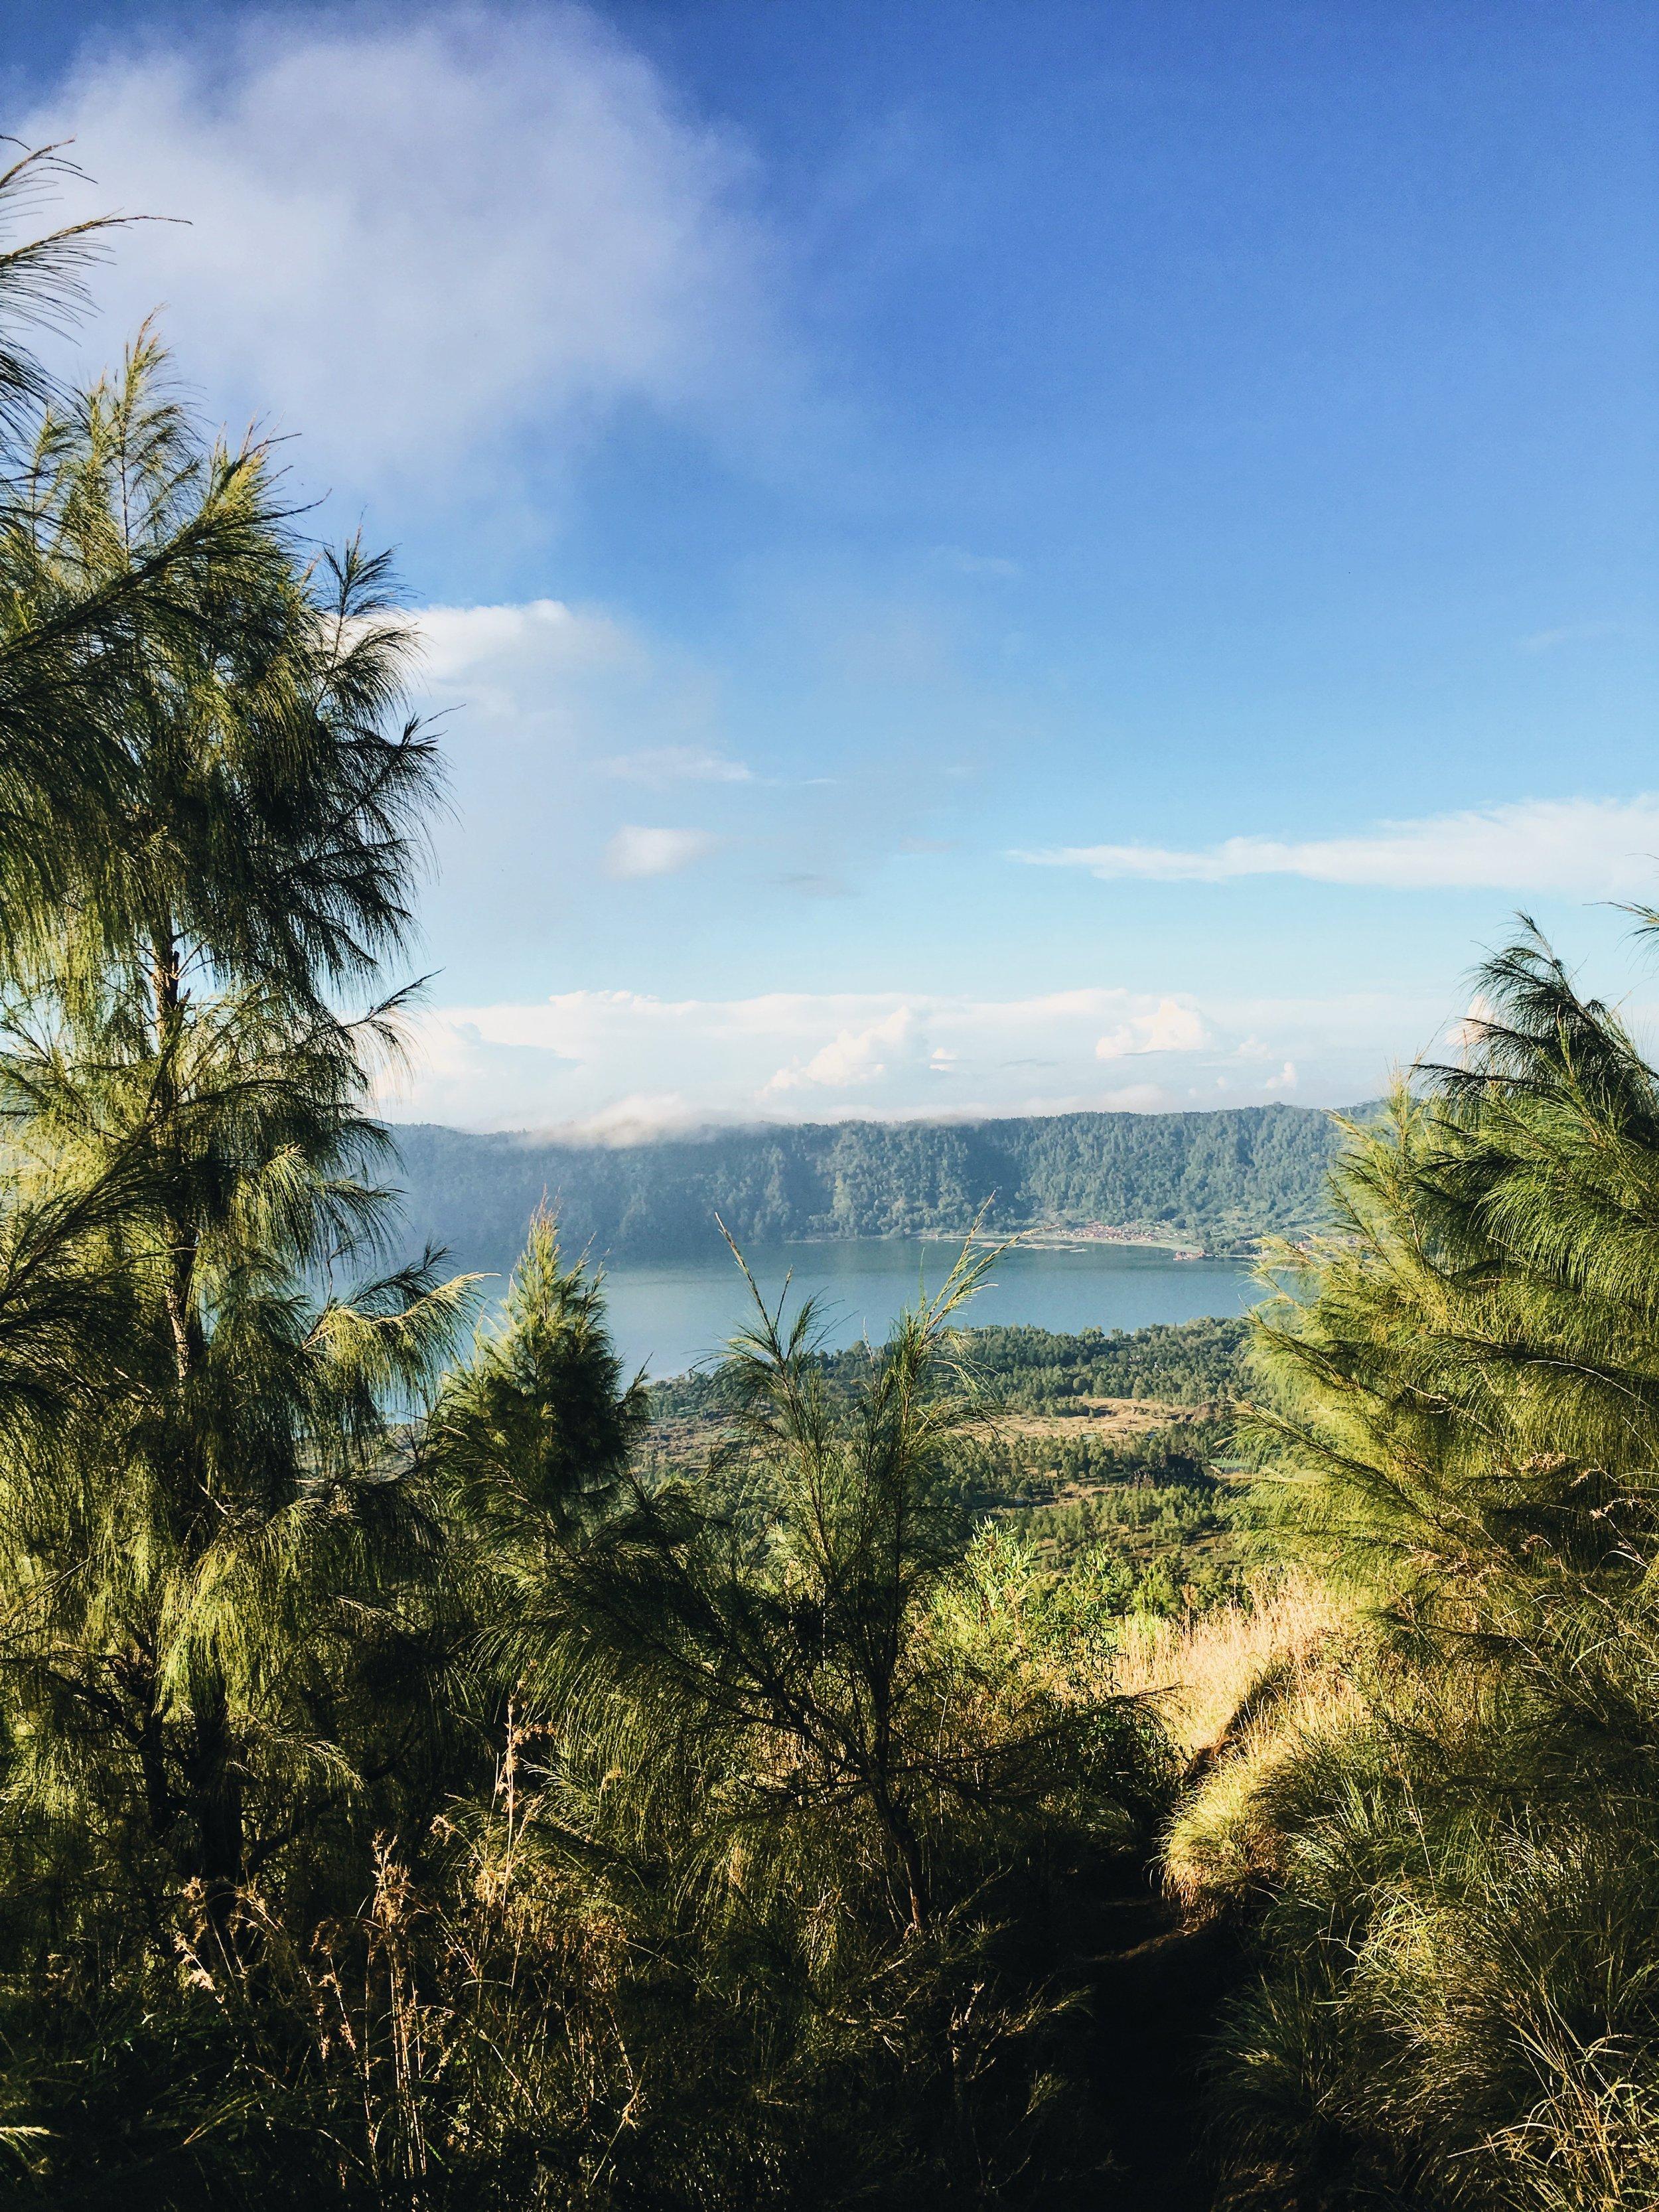 Kintamani Lake, Mount Batur Sunrise Hike, Bali, illumelation.com